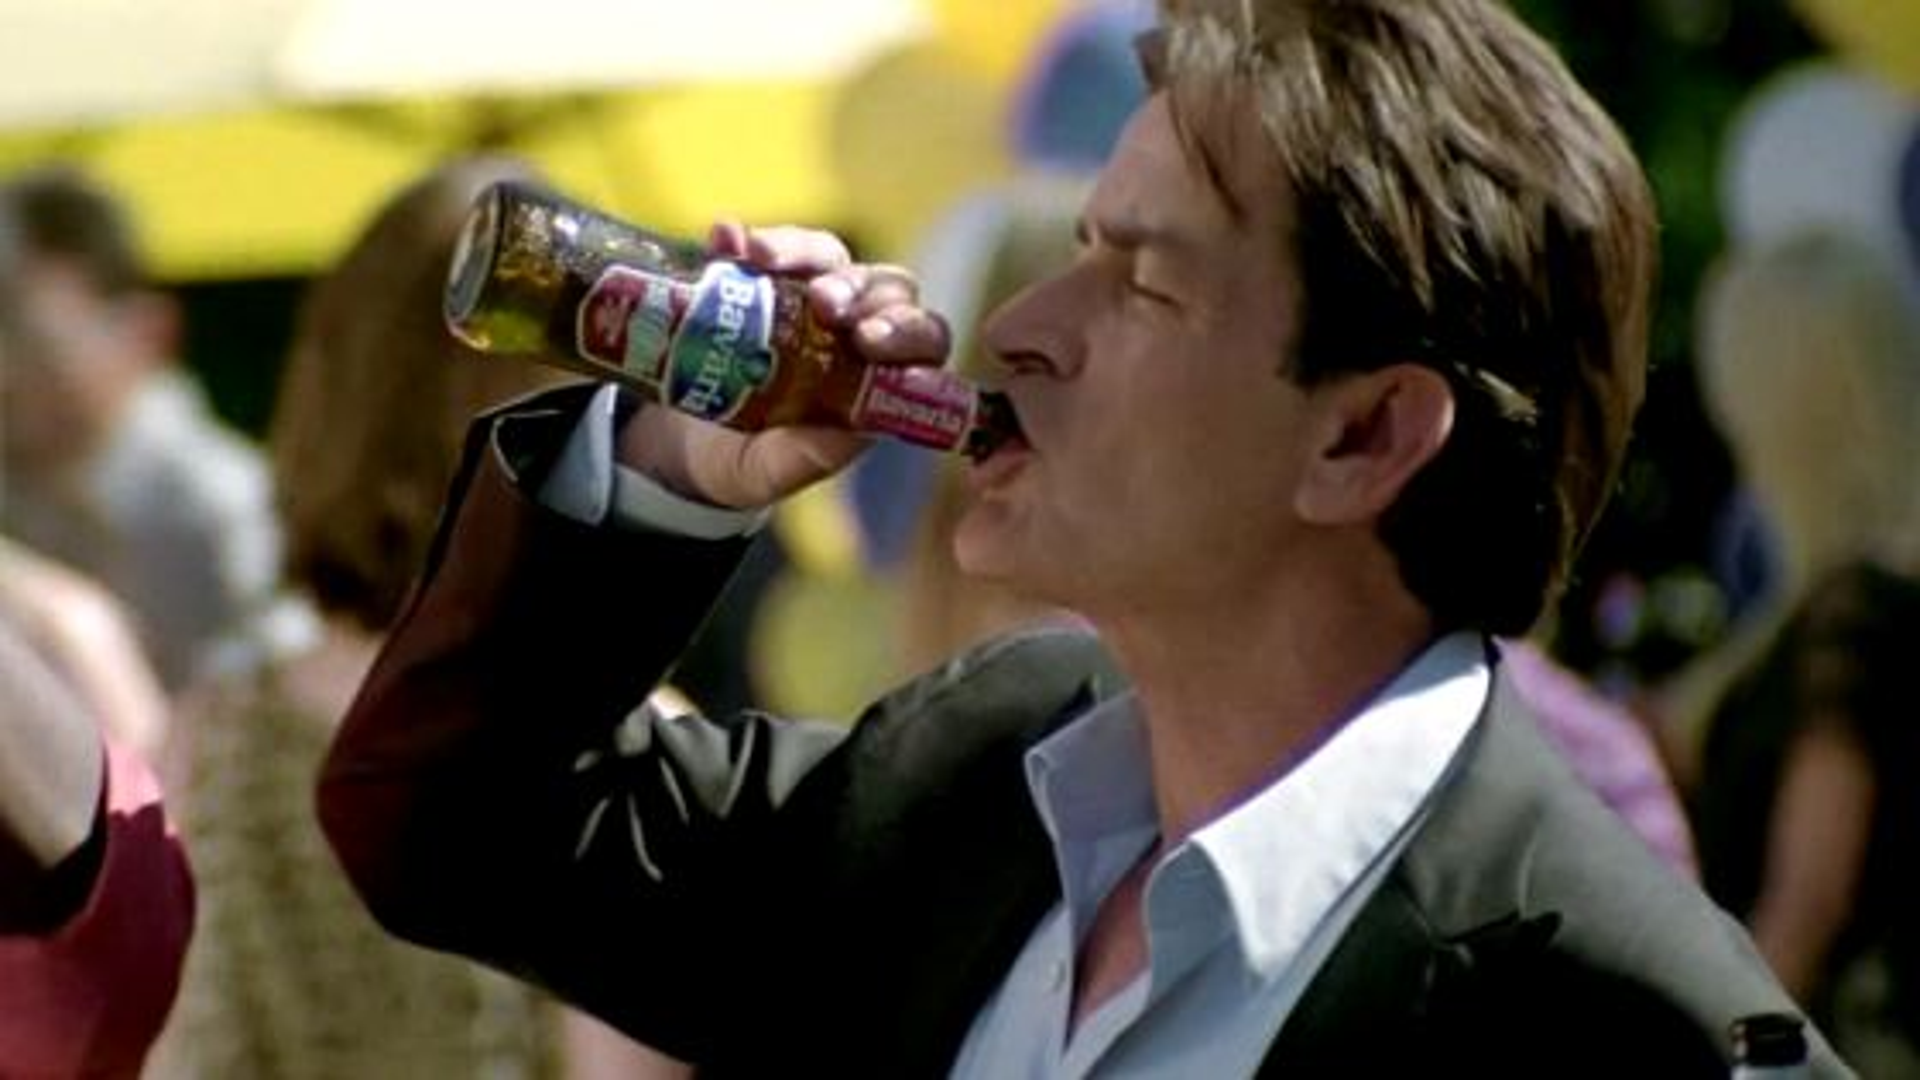 Charlie-Sheen-Bierwerbung